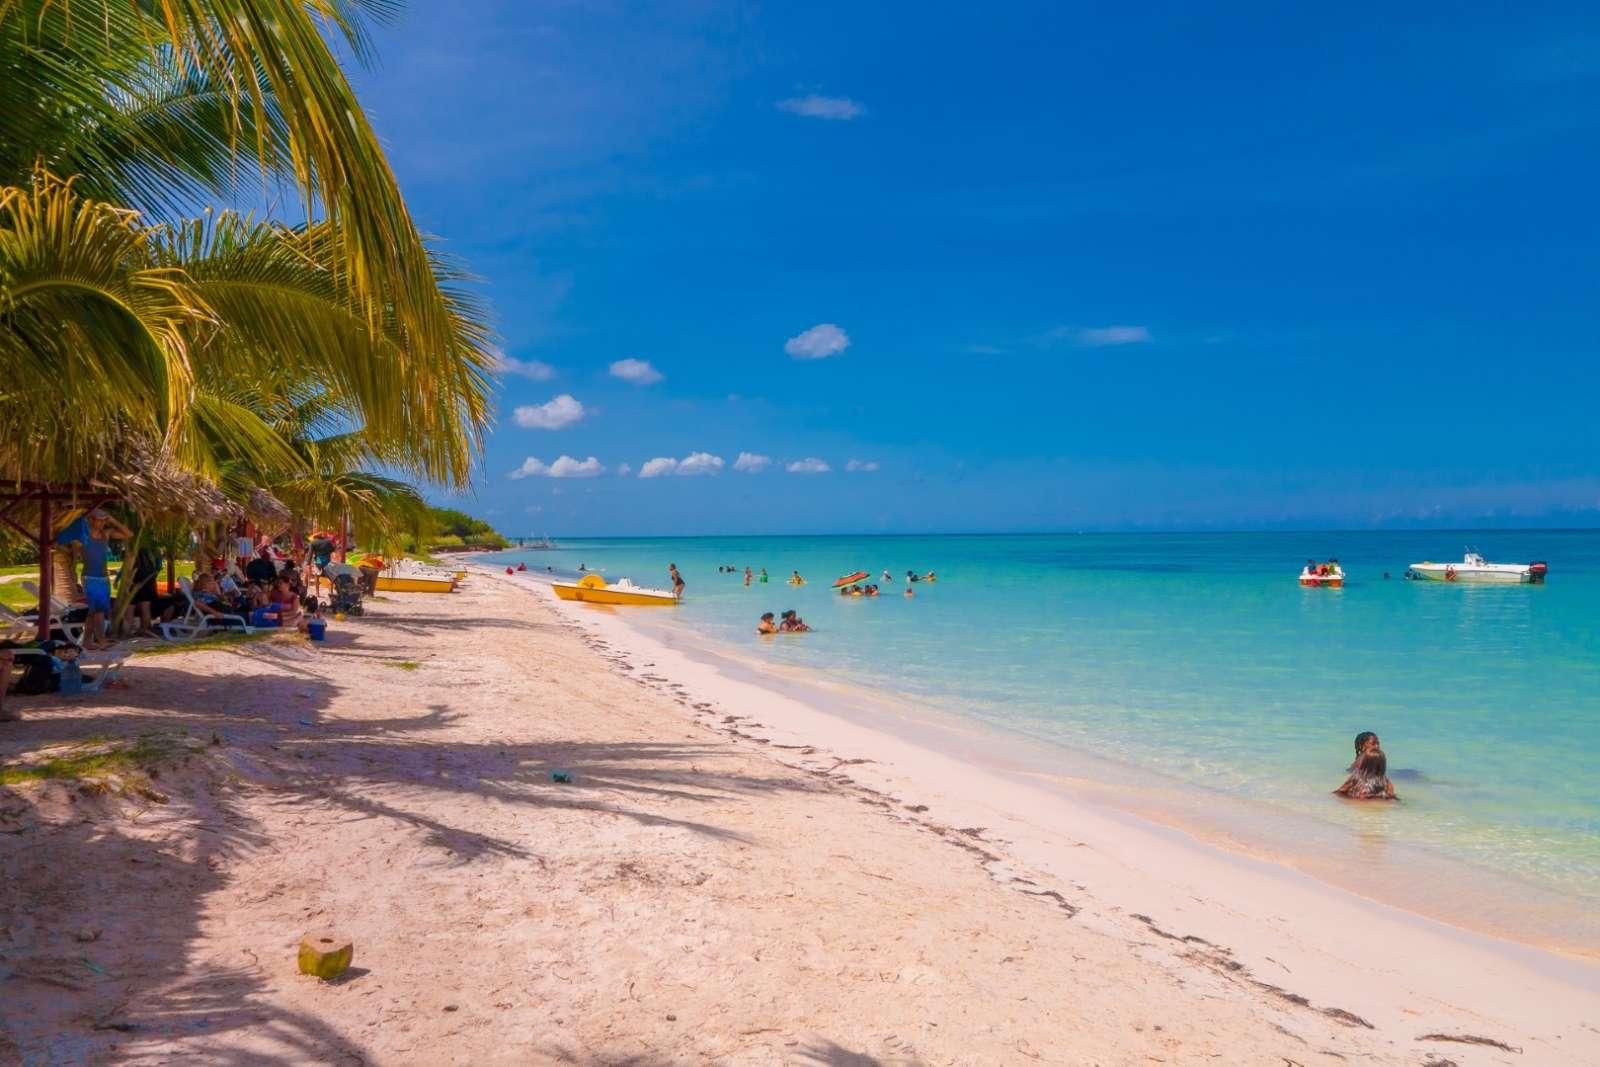 Cayo Jutias Beach near Vinales, Cuba